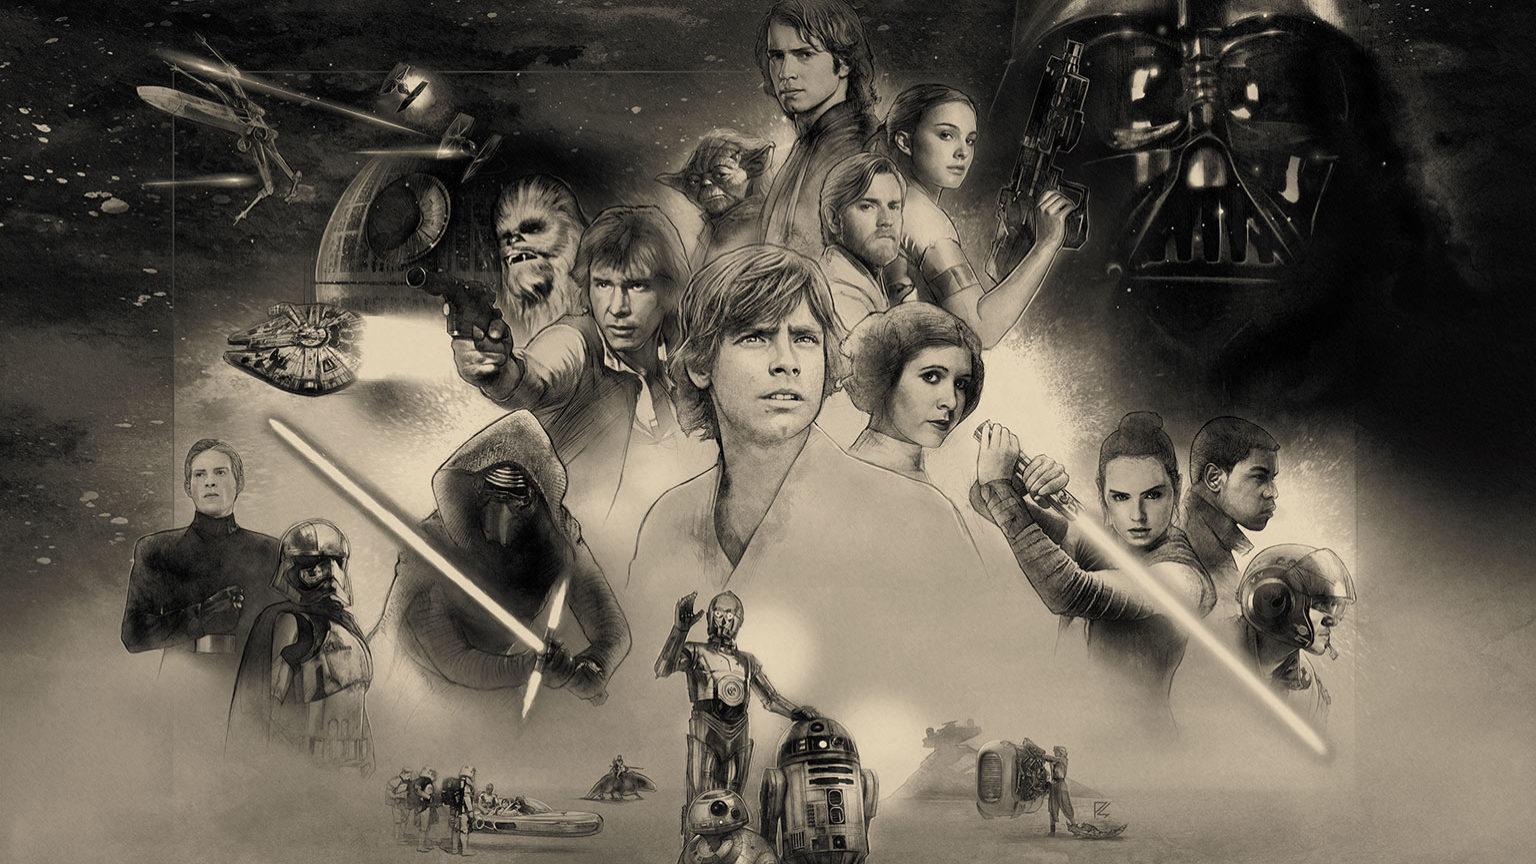 Star Wars 40th Anniversary Celebration Wallpaper By The Dark Mamba